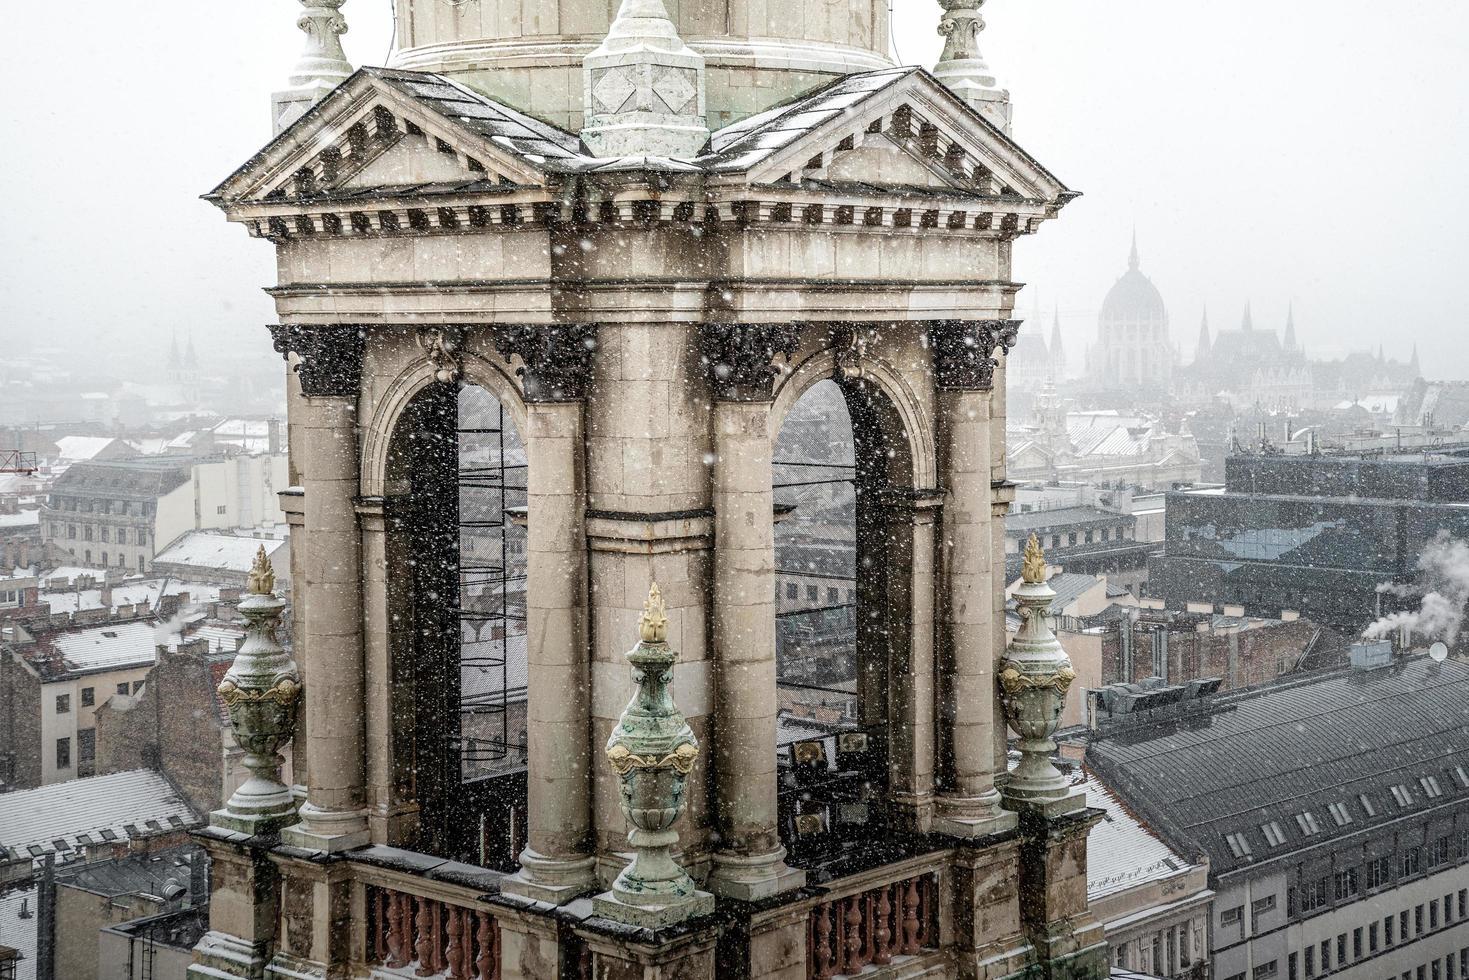 budapest, Hongrie 2019 - clocher de st. basilique stephen photo